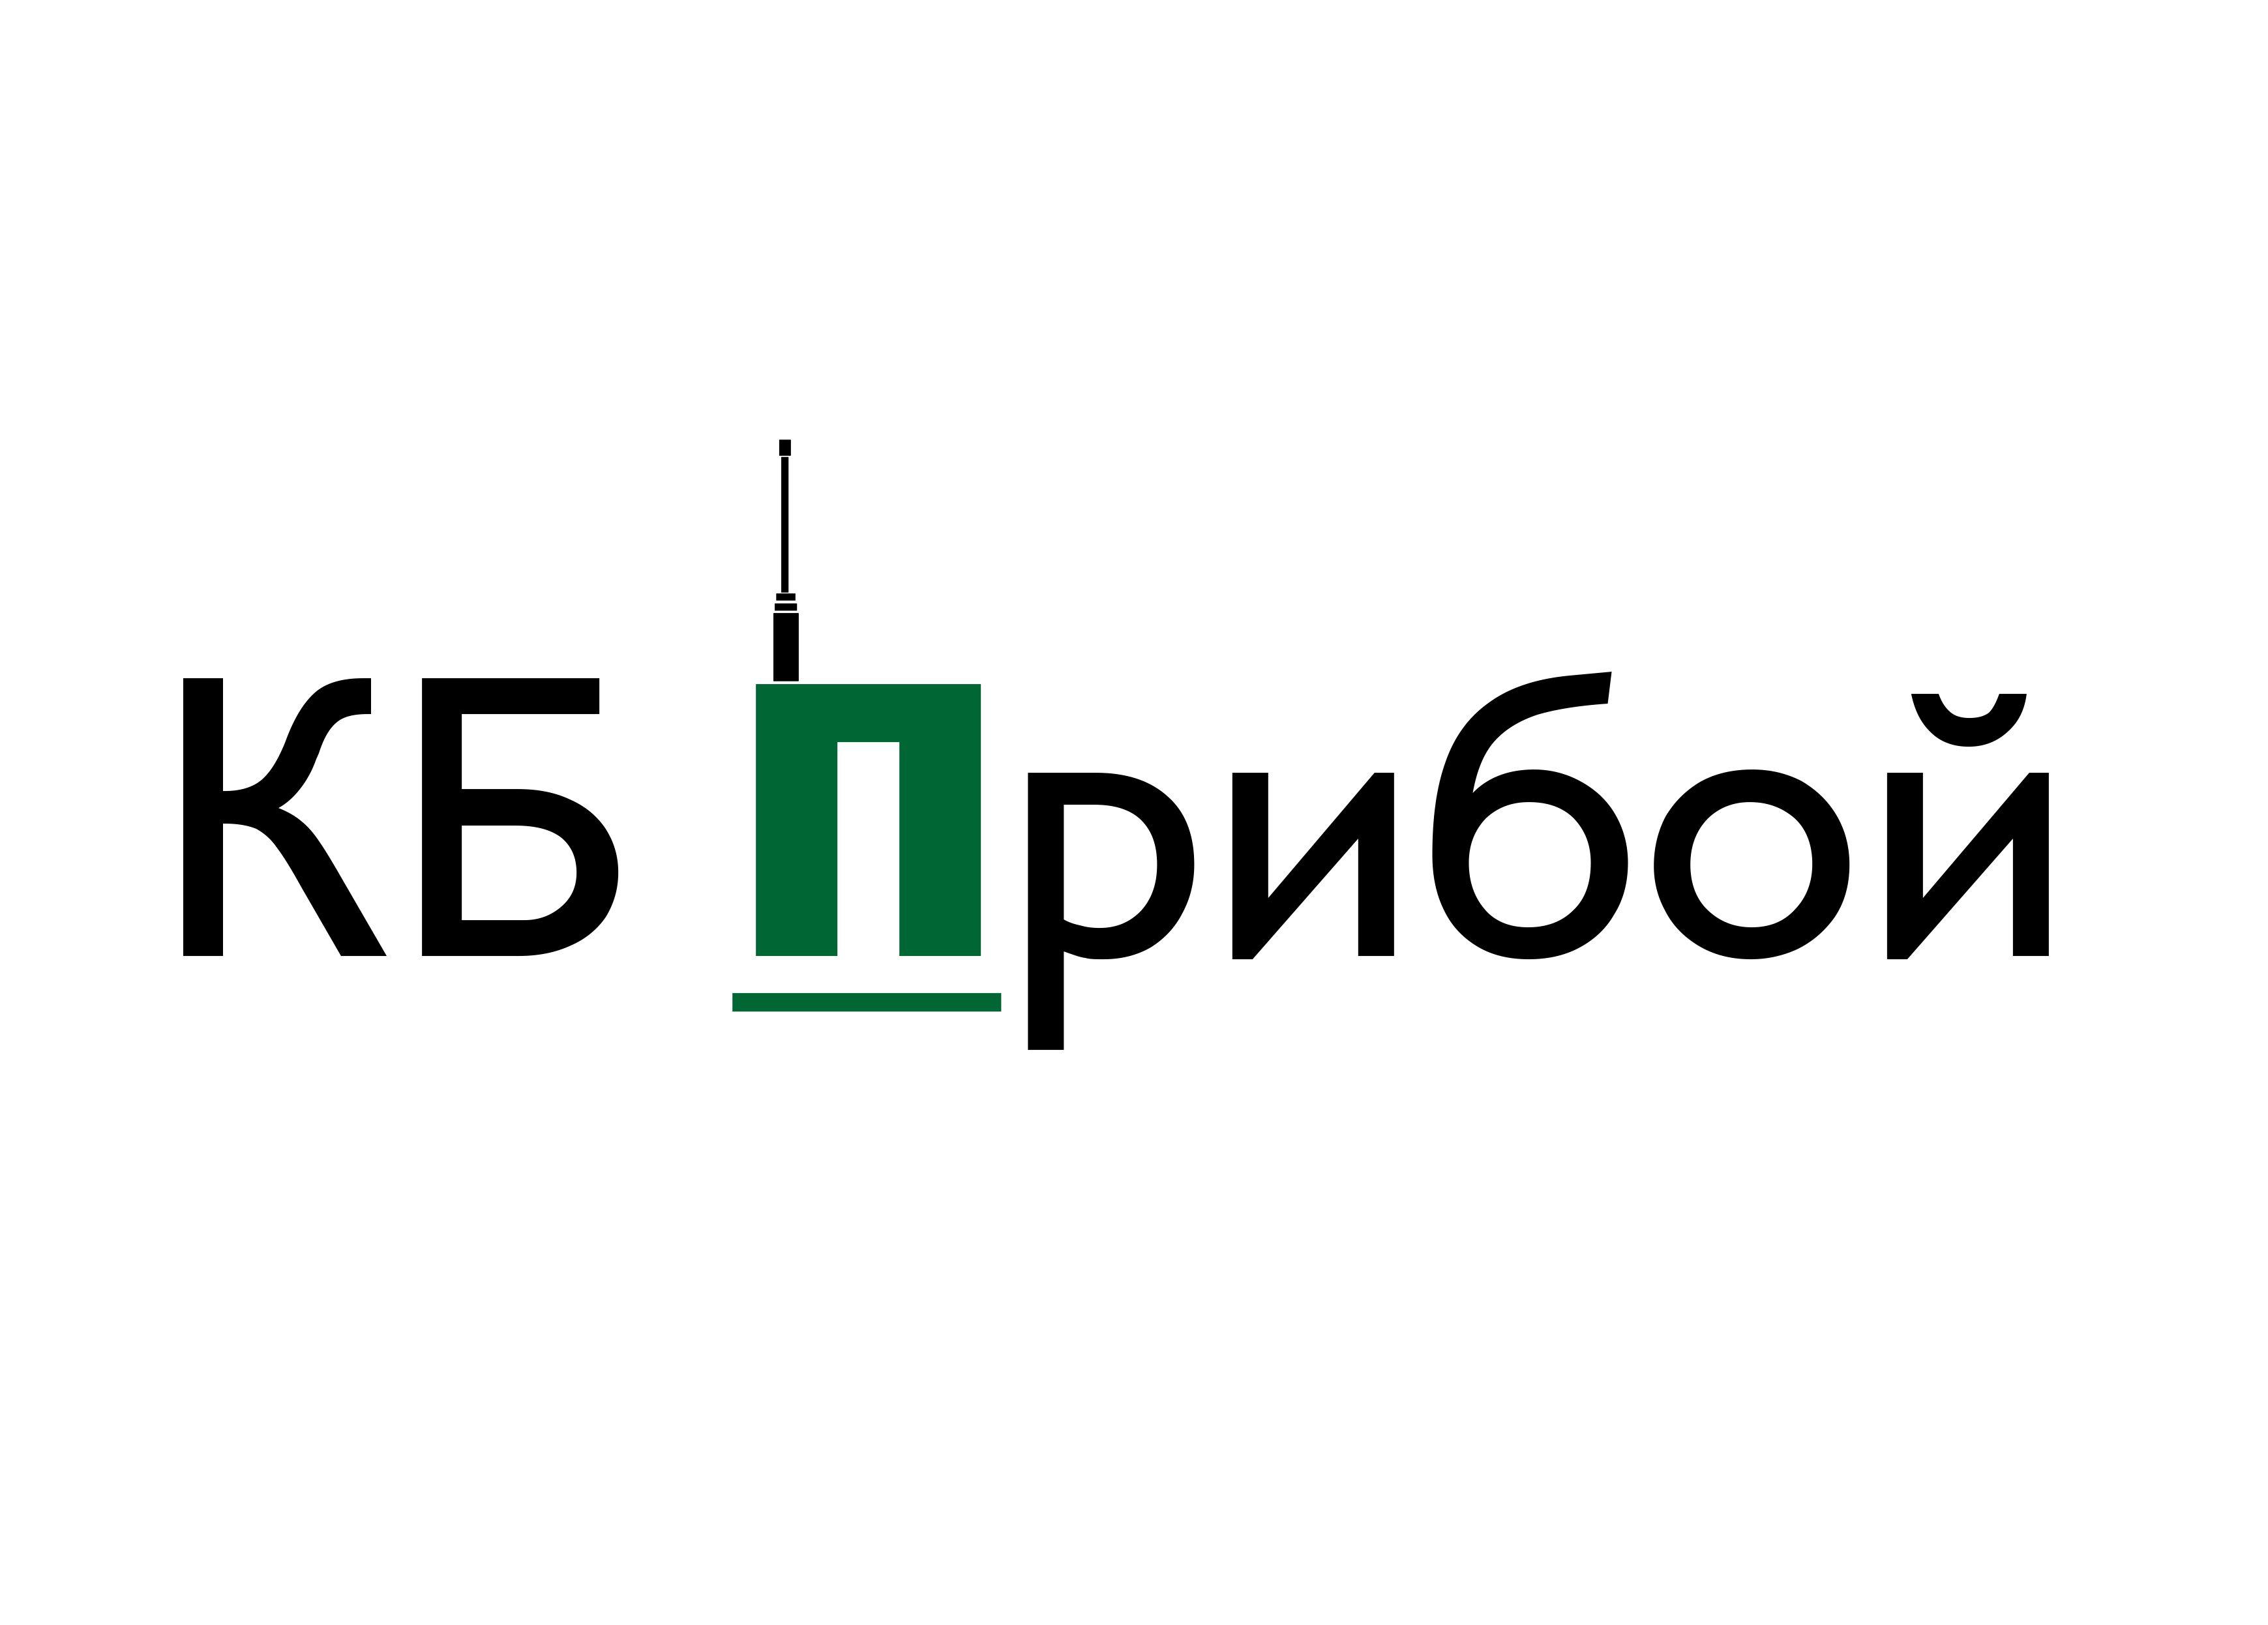 Разработка логотипа и фирменного стиля для КБ Прибой фото f_9595b2387bf07fa0.jpg